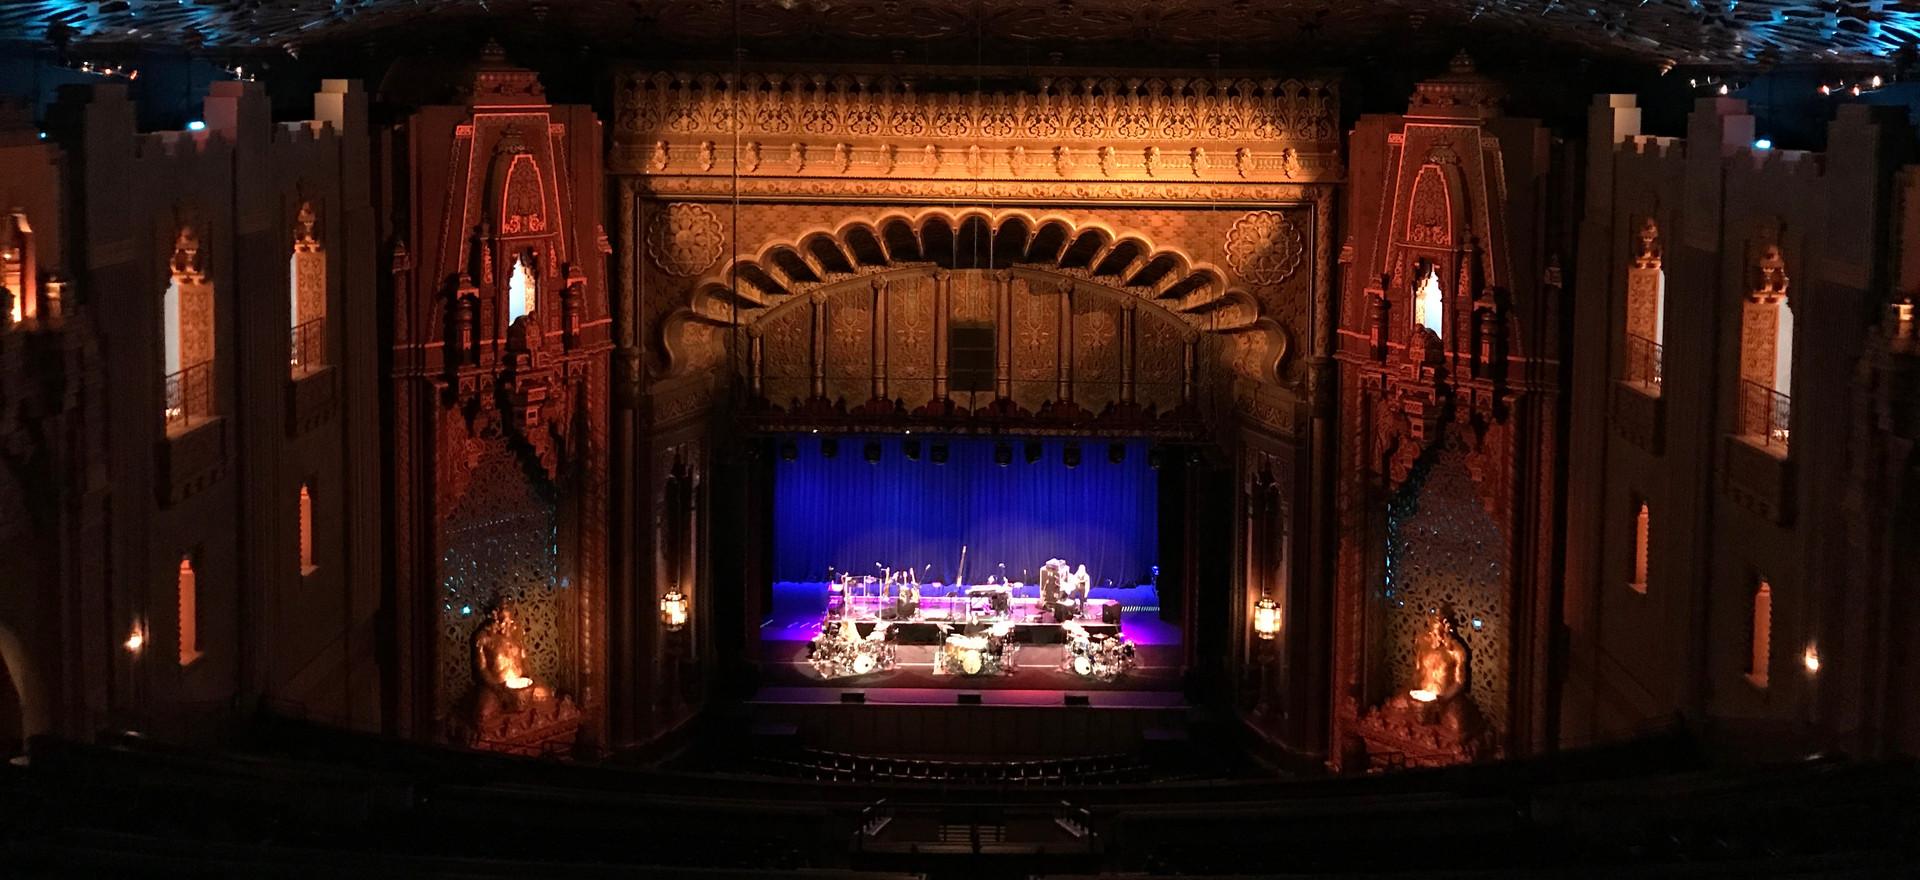 Fox Theater - Oakland, CA